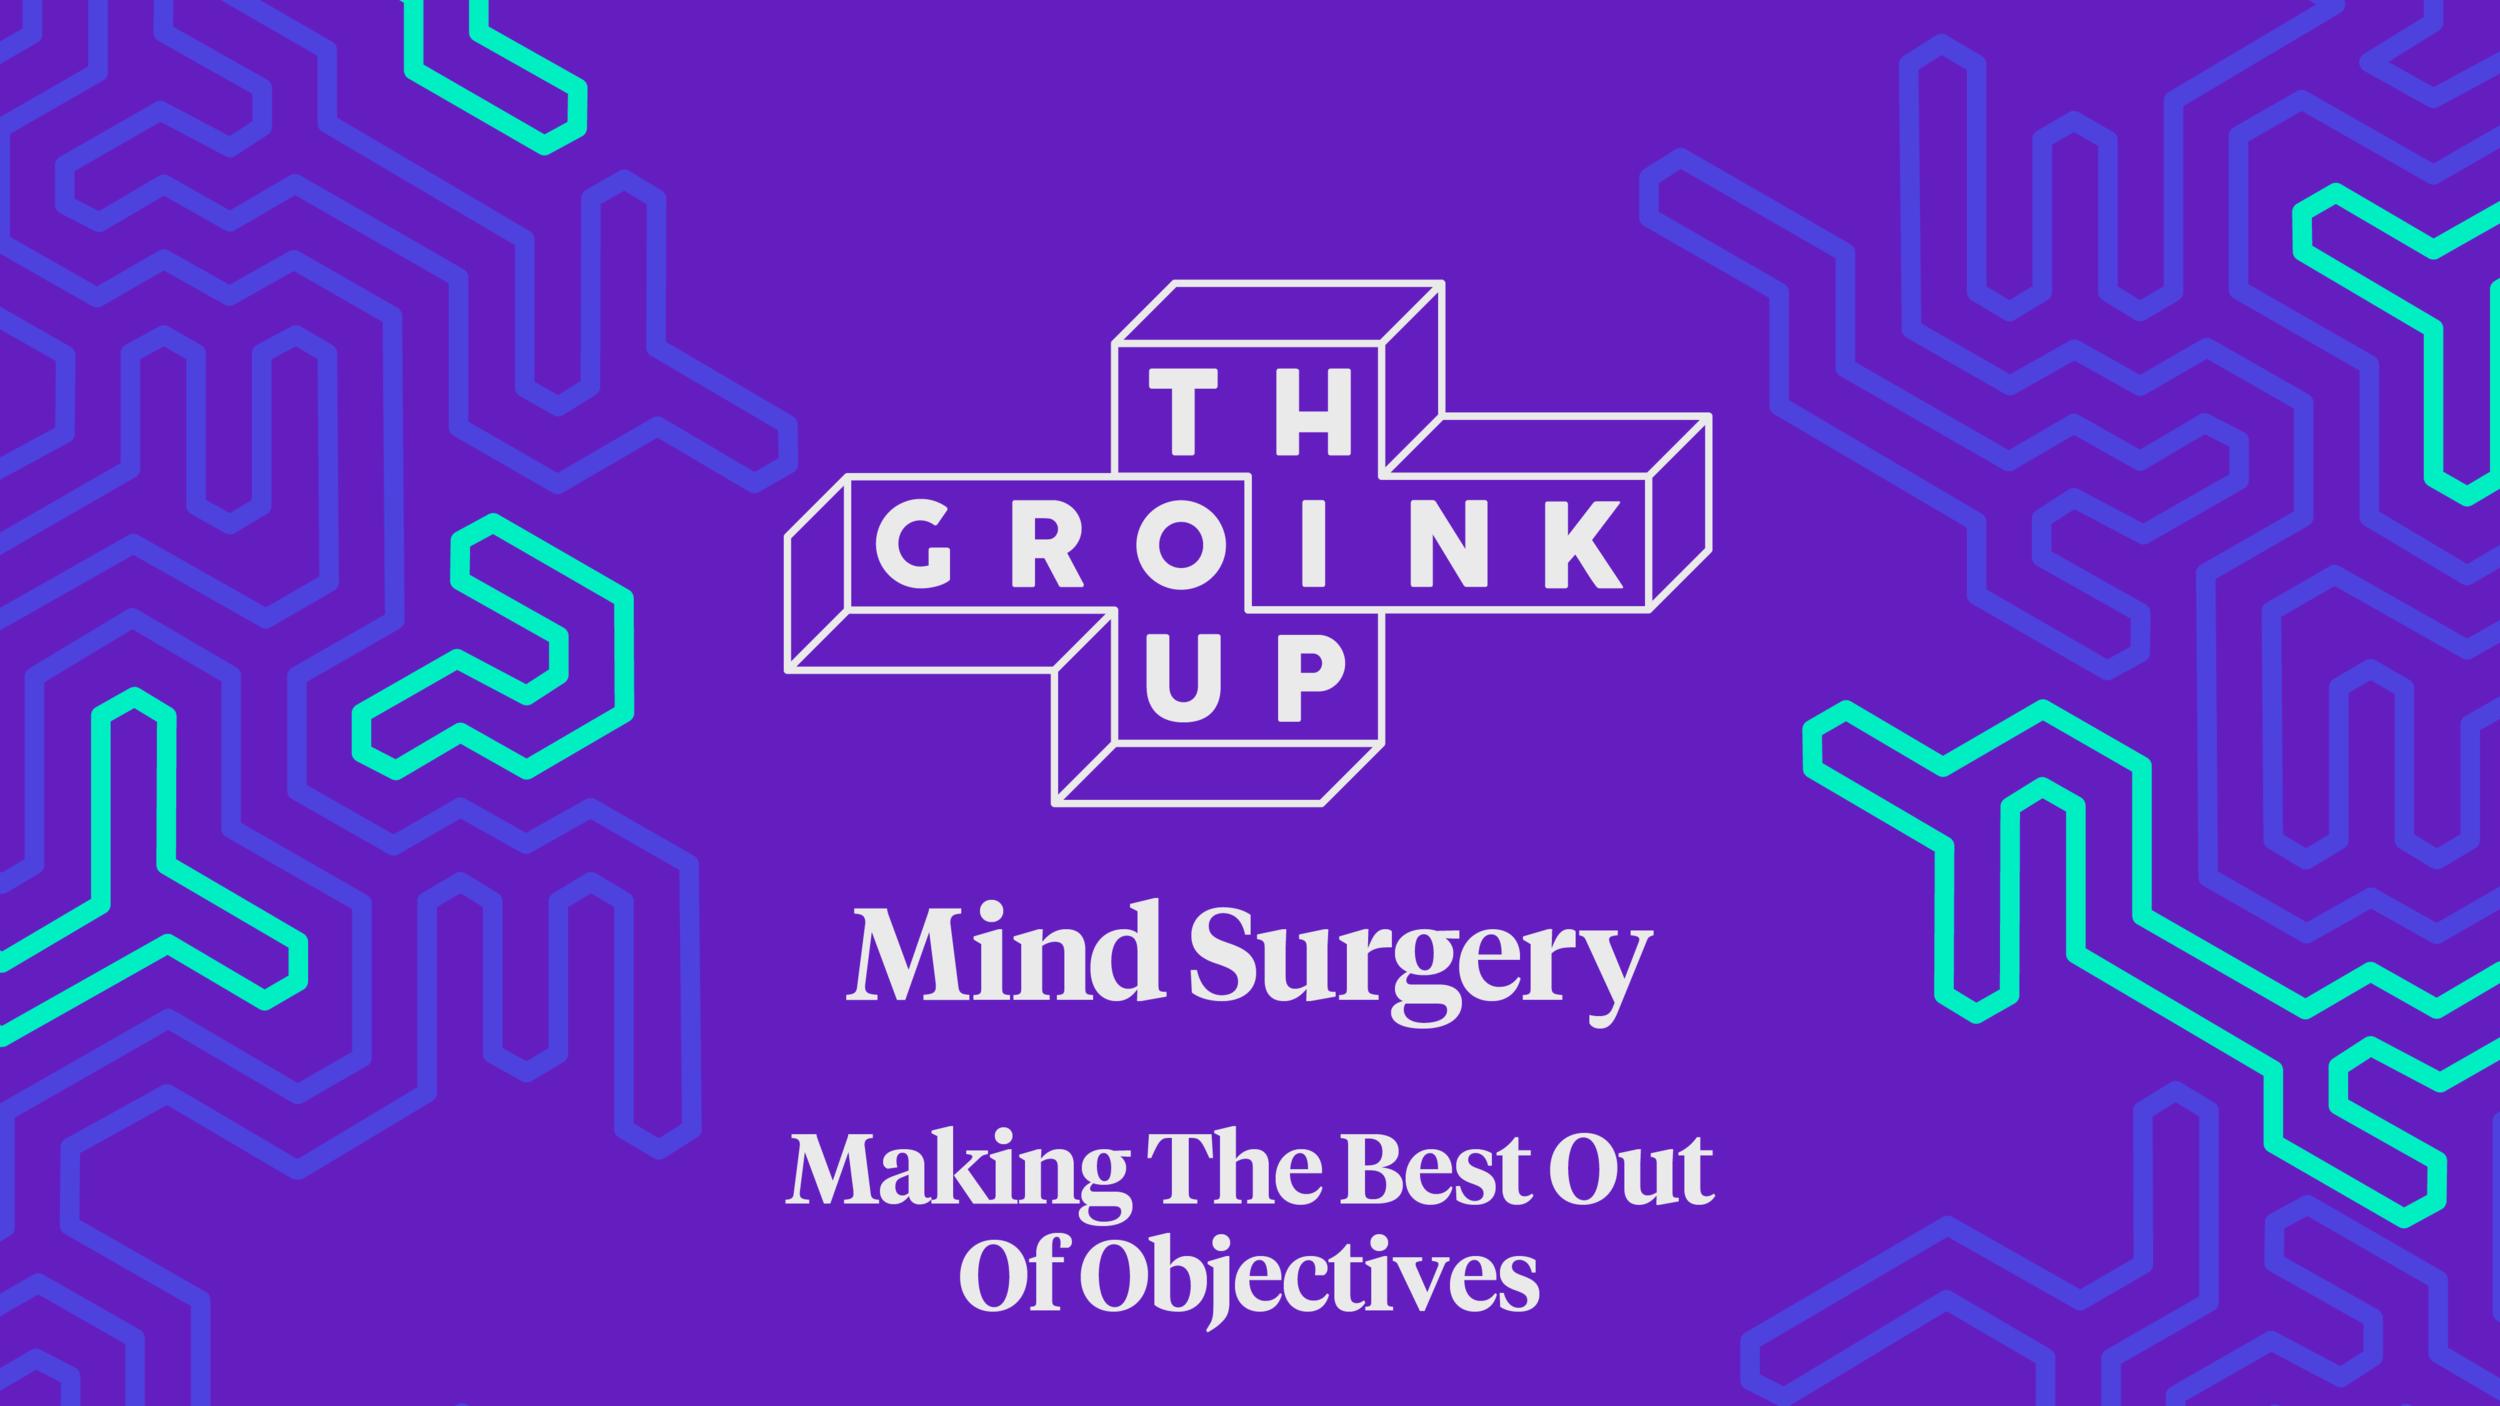 Mindsurgery_Objectives-01.png